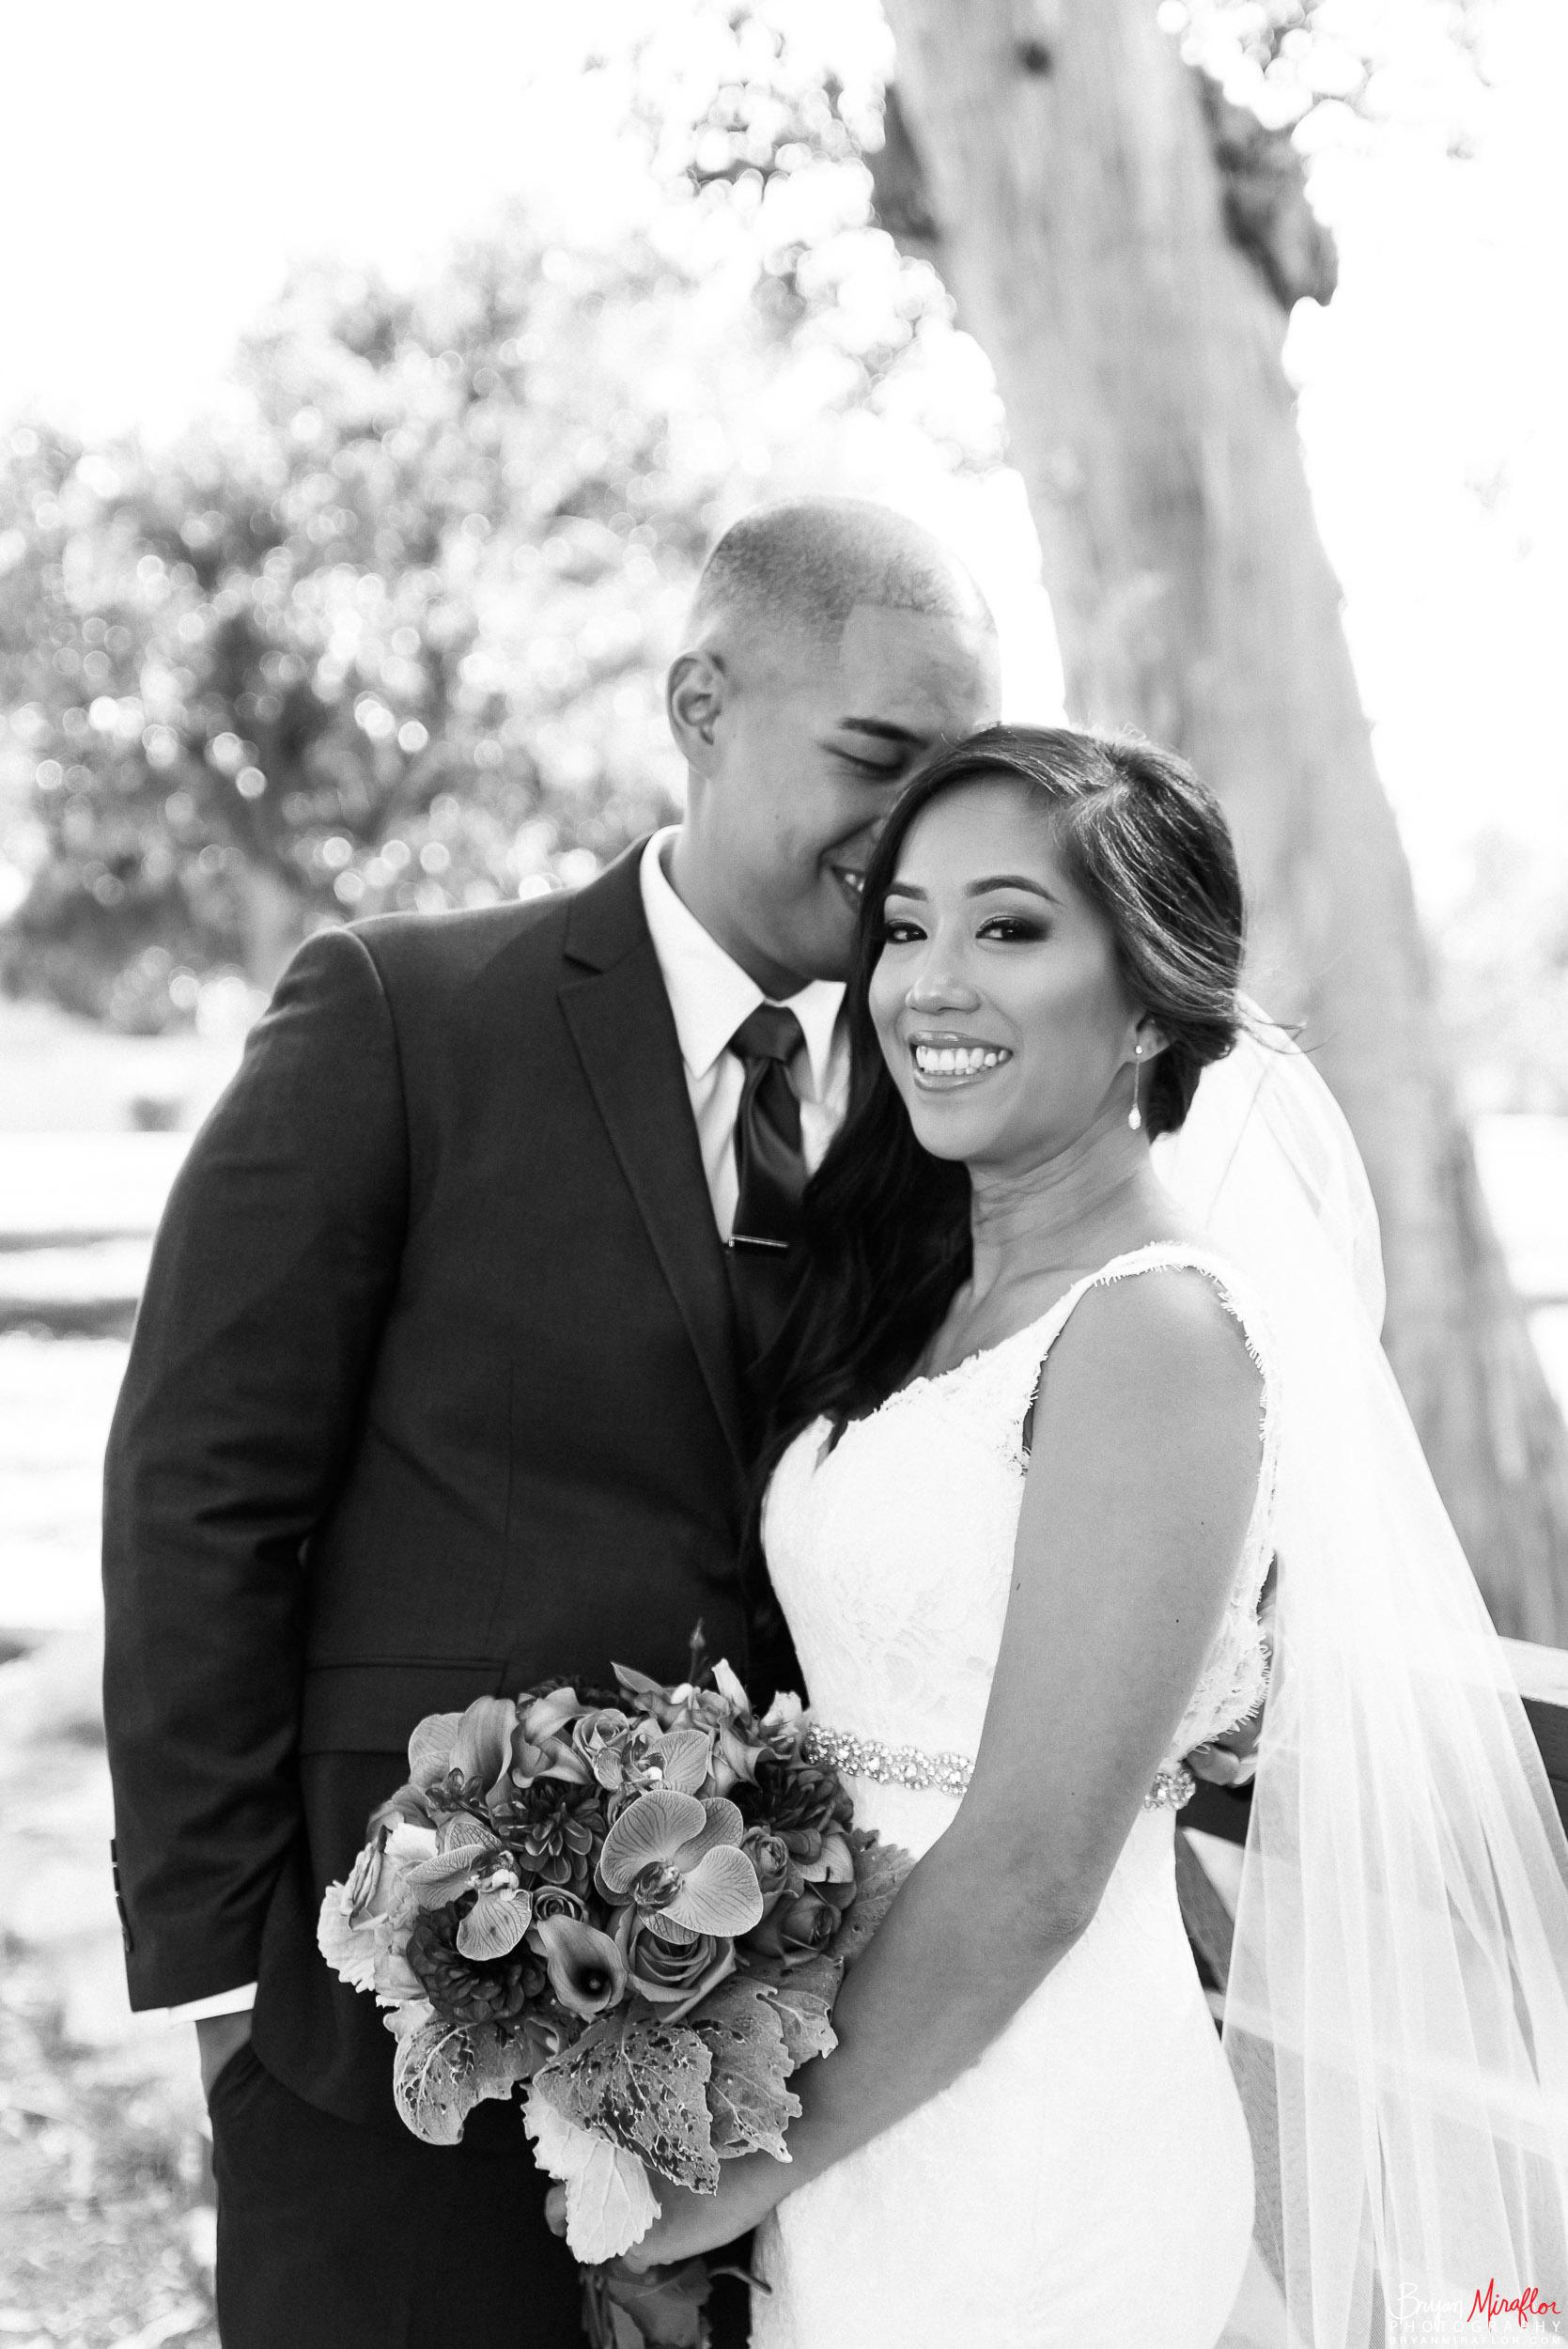 Bryan-Miraflor-Photography-Trisha-Dexter-Married-20170923-038.jpg